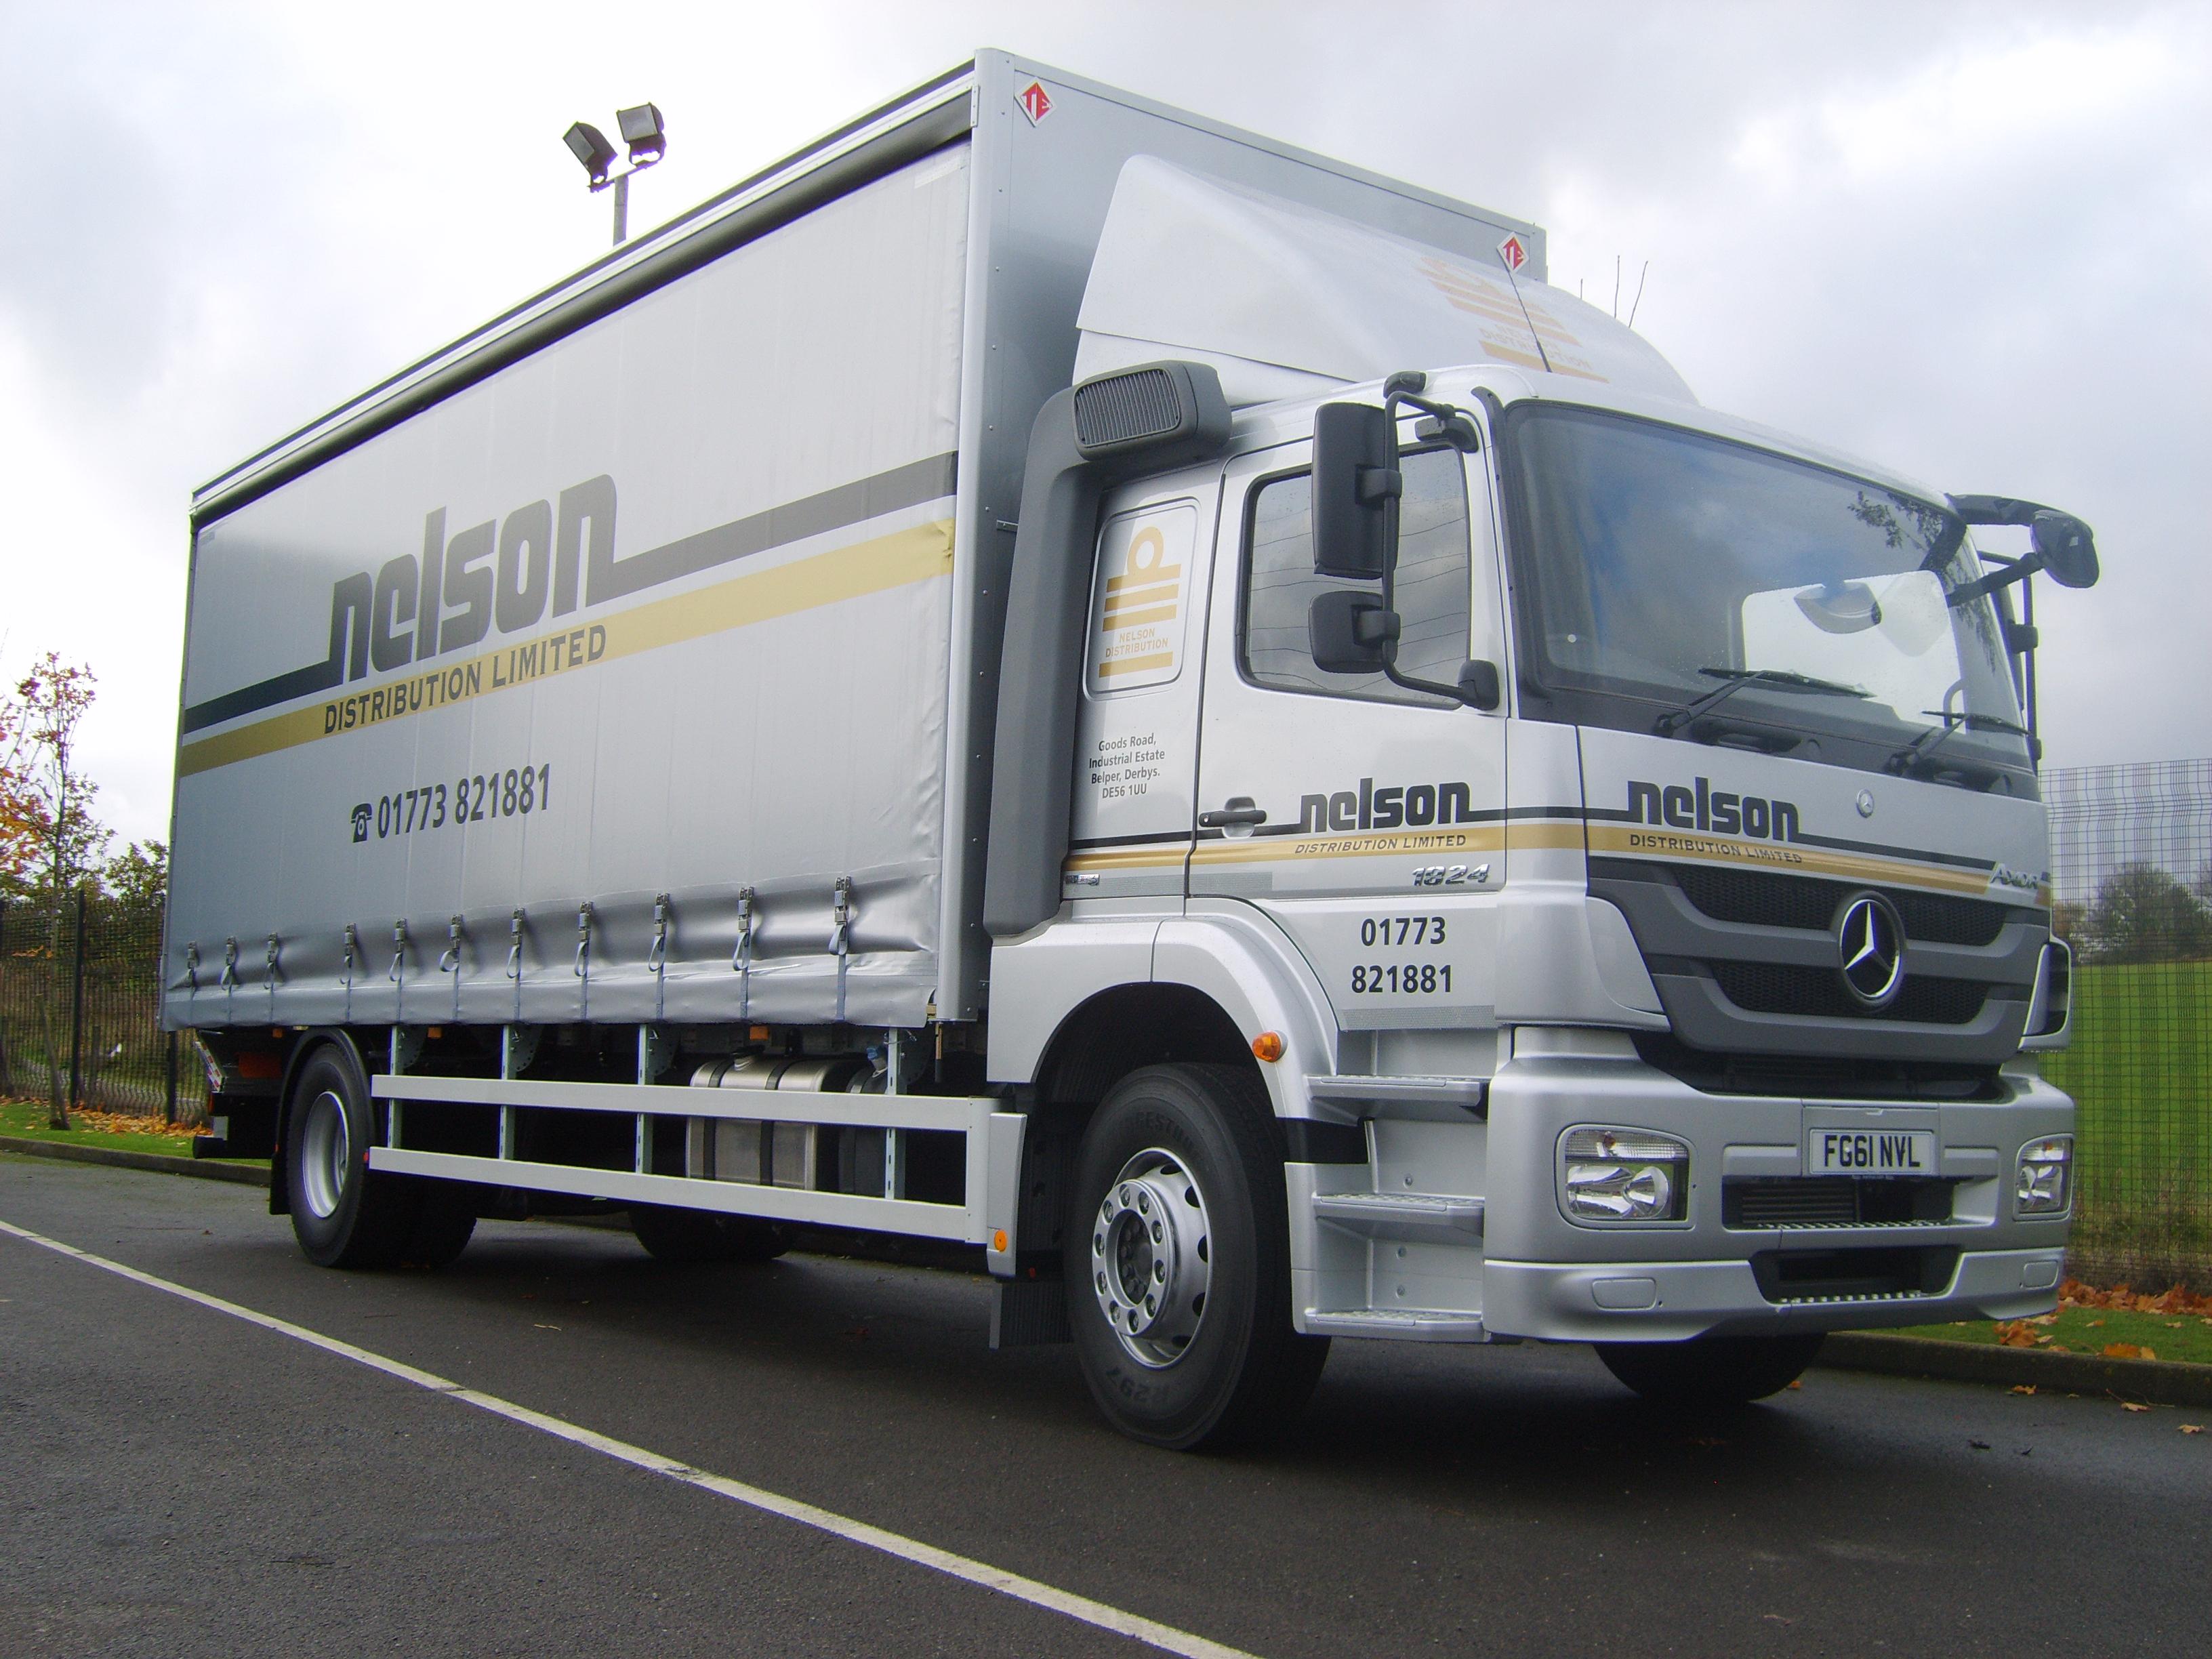 Nelson truck graphics